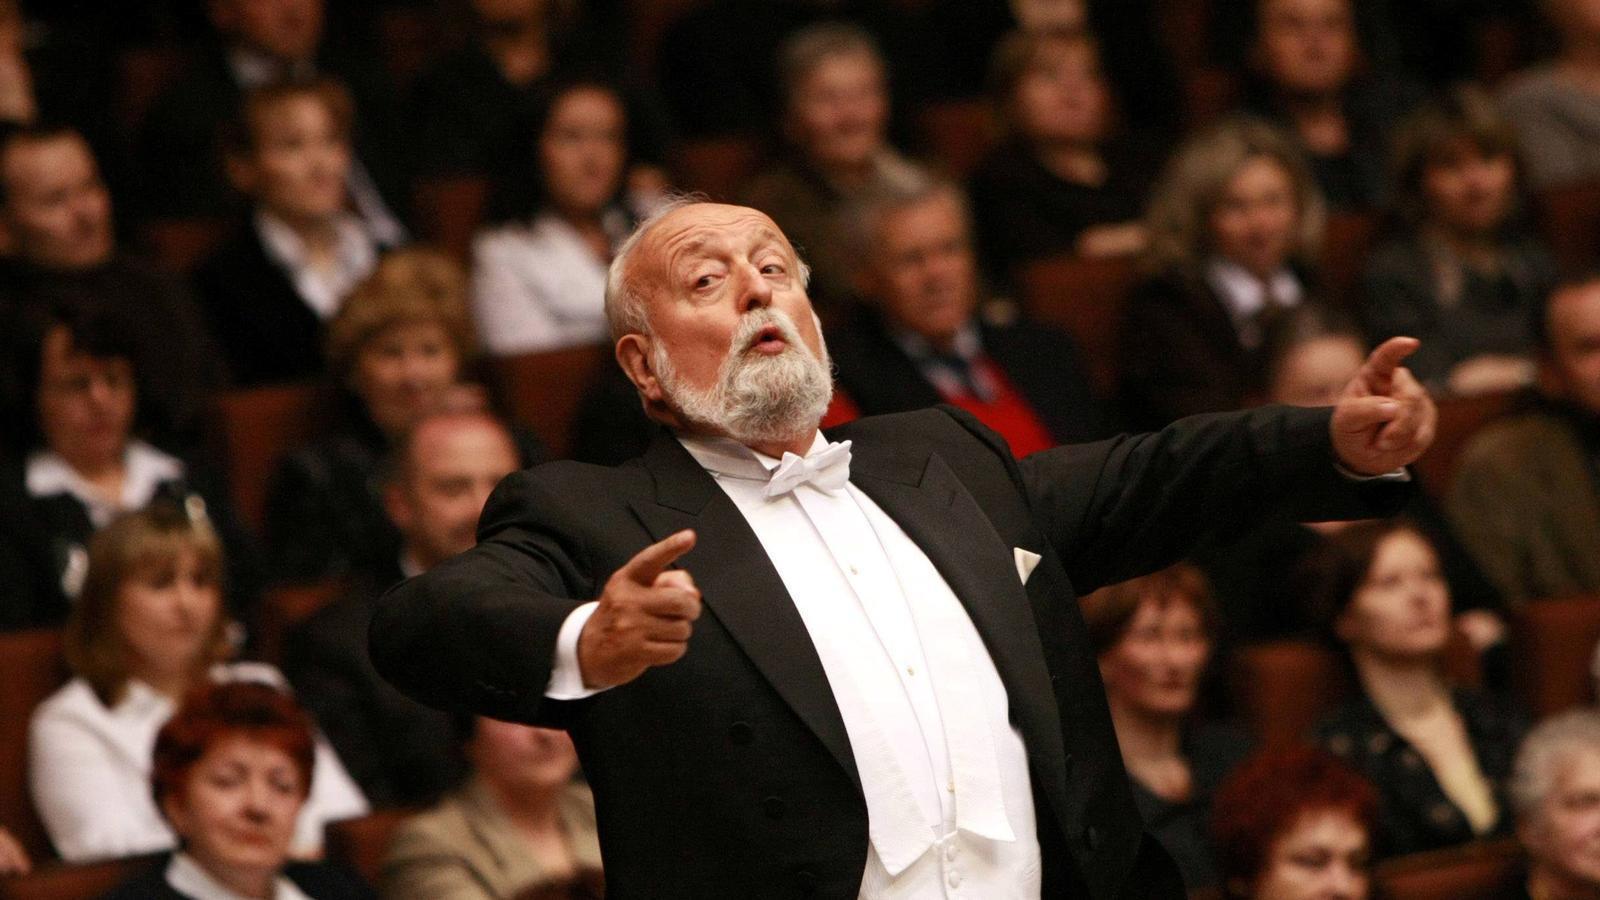 Krzysztof Penderecki dirigint un concert a Polònia l'any 2009.